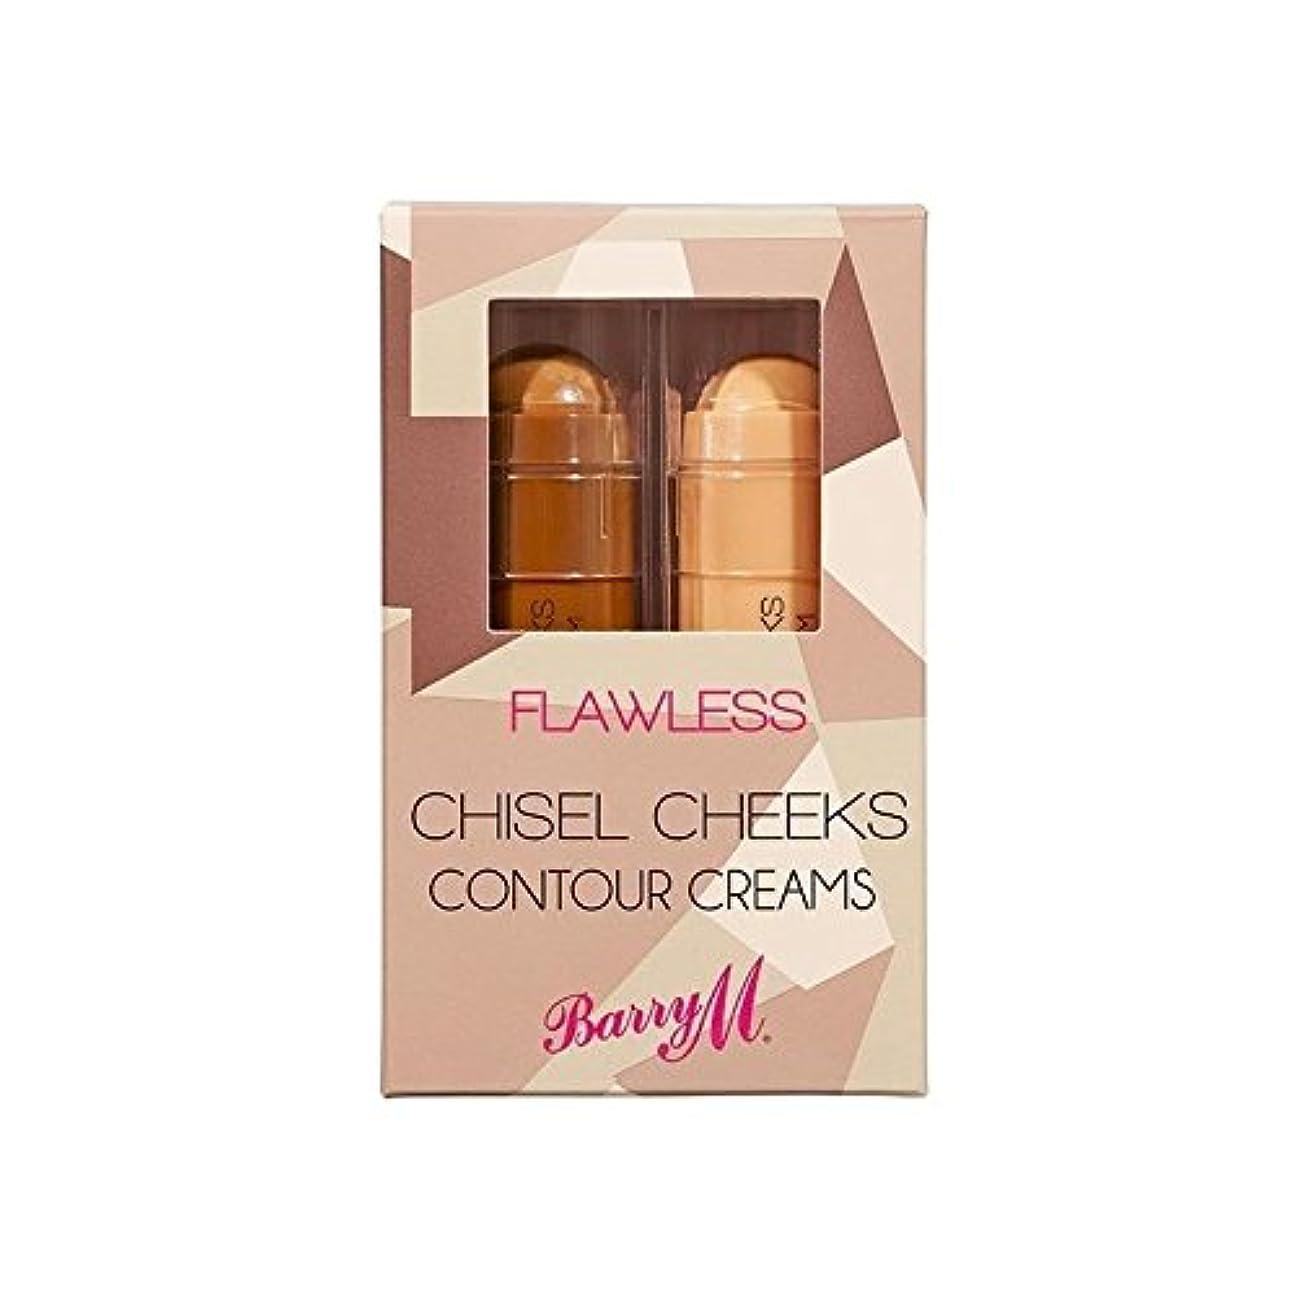 Barry M Chisel Cheek Contour Creams (Pack of 6) - バリーメートルチゼル頬の輪郭クリーム x6 [並行輸入品]